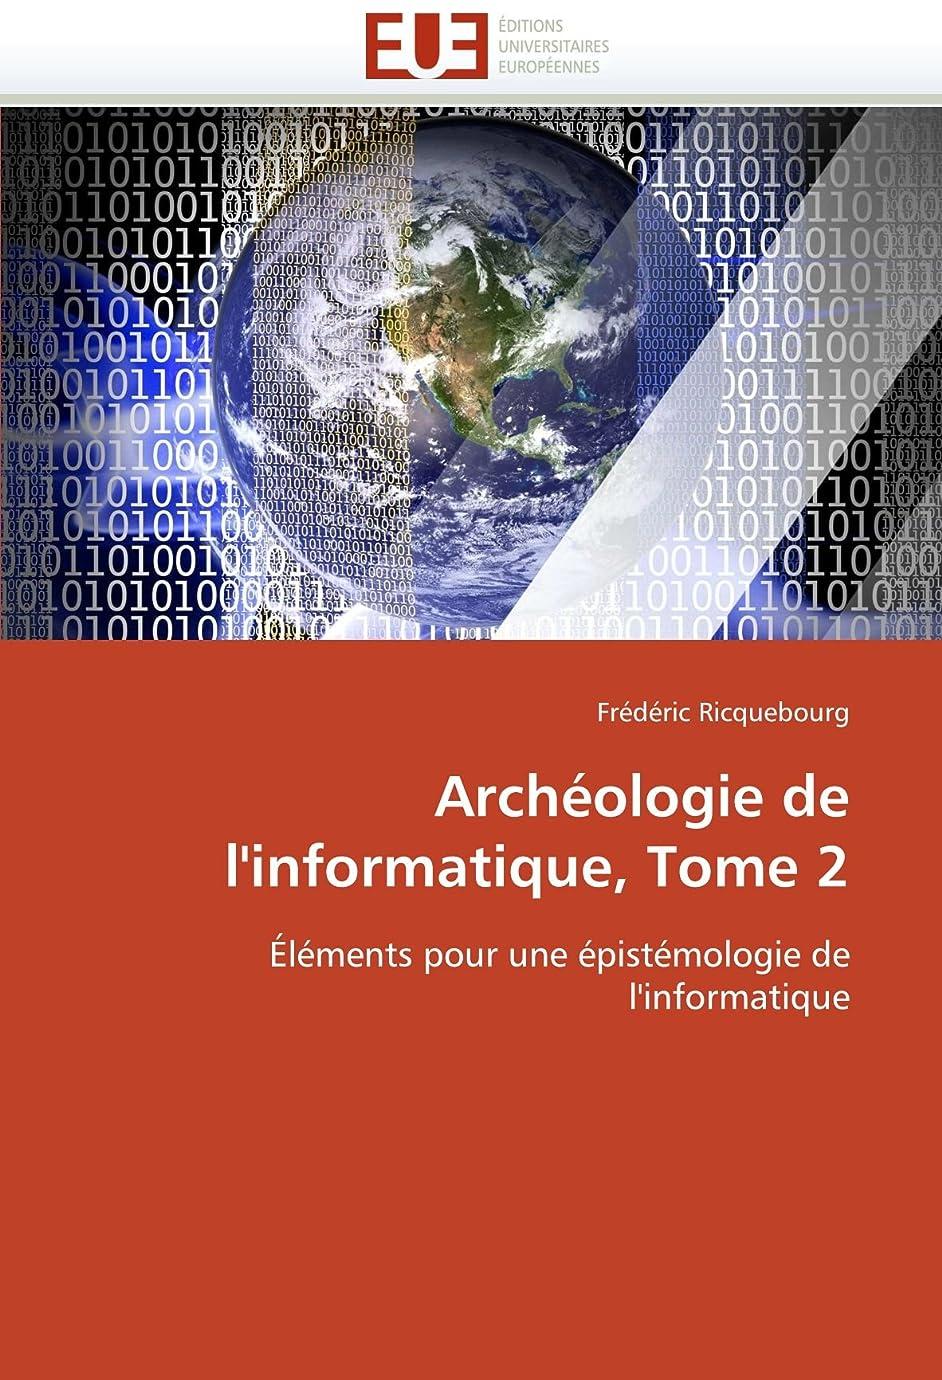 生む予防接種同盟Archéologie de l'Informatique, Tome 2 (Omn.Univ.Europ.)